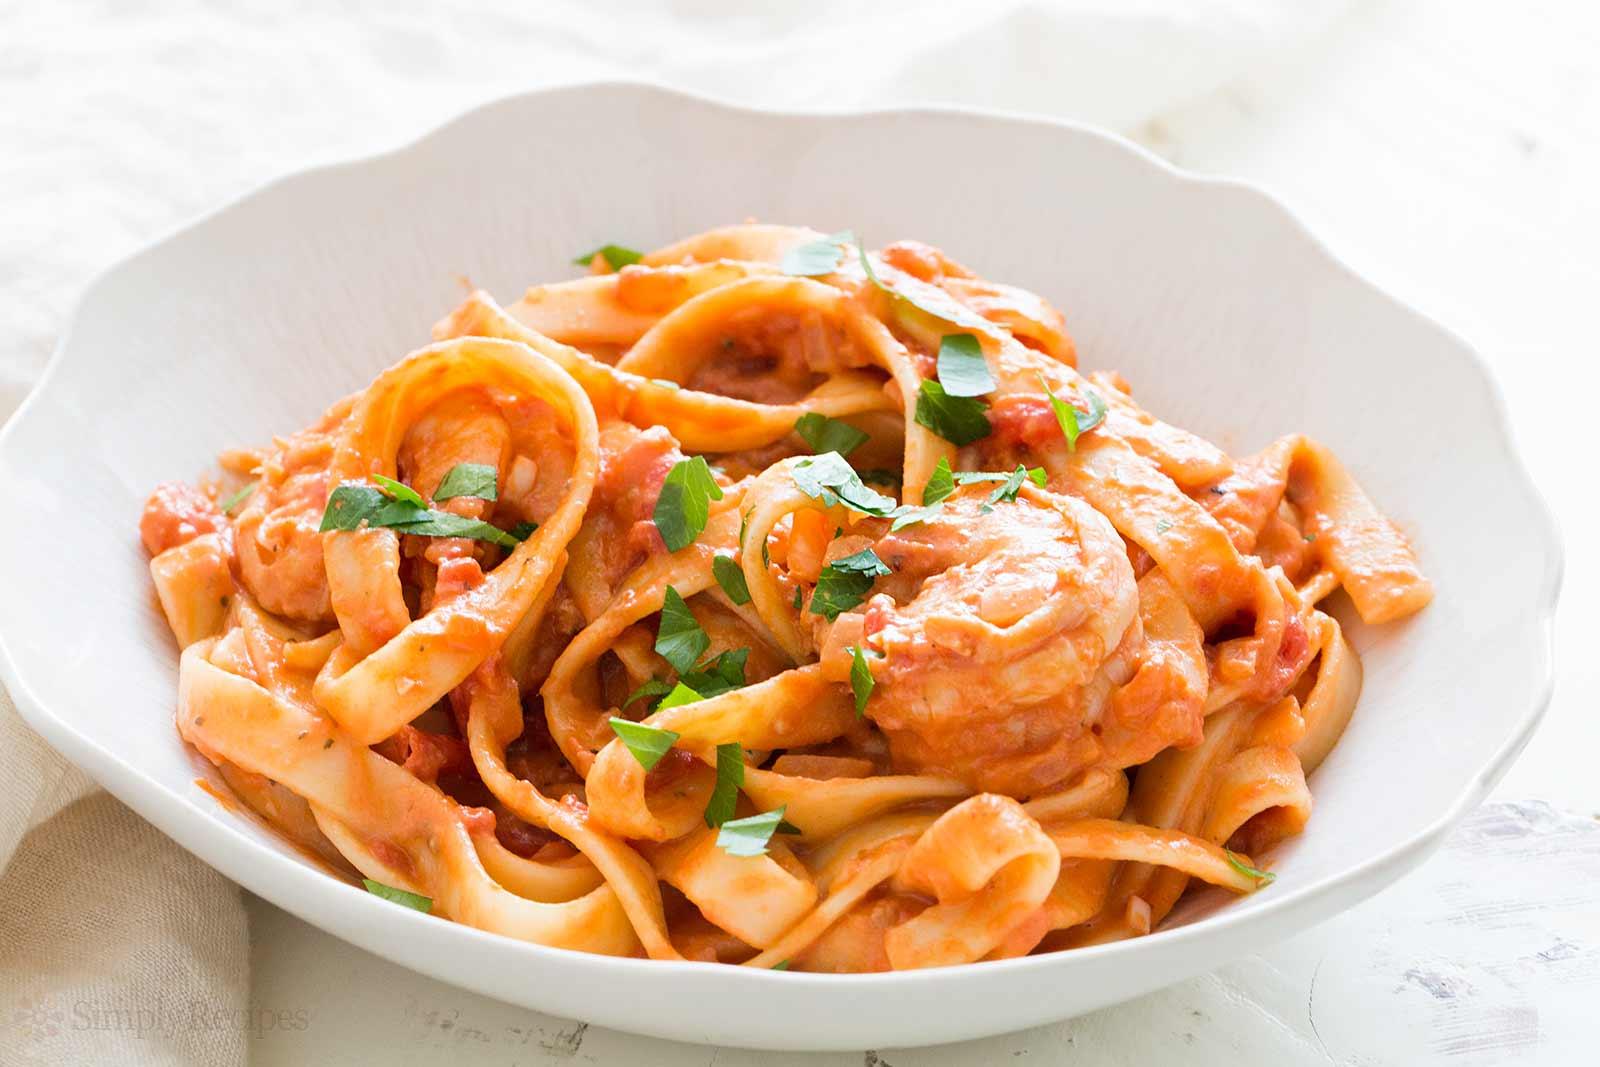 shrimp-pasta-vodka-horiz-a-1600.jpg